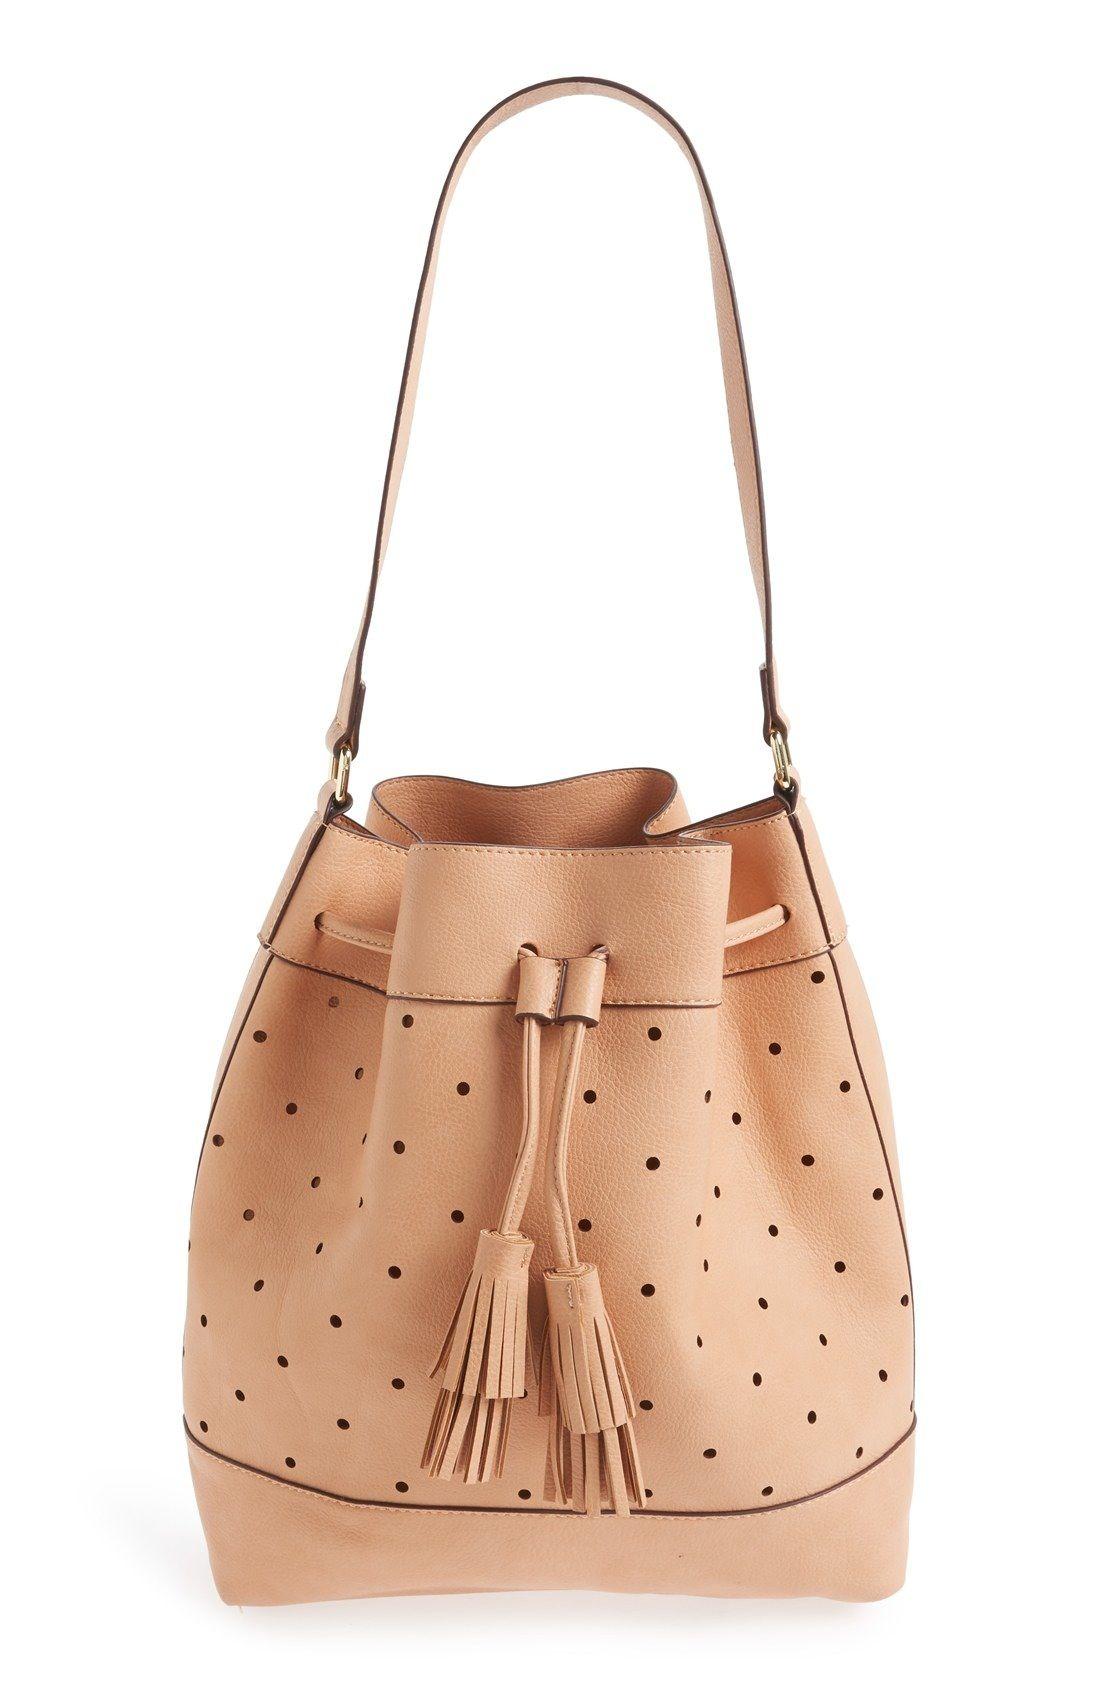 65169202f Kattia' Faux Leather Drawstring Bucket Bag | My Style | Pinterest ...